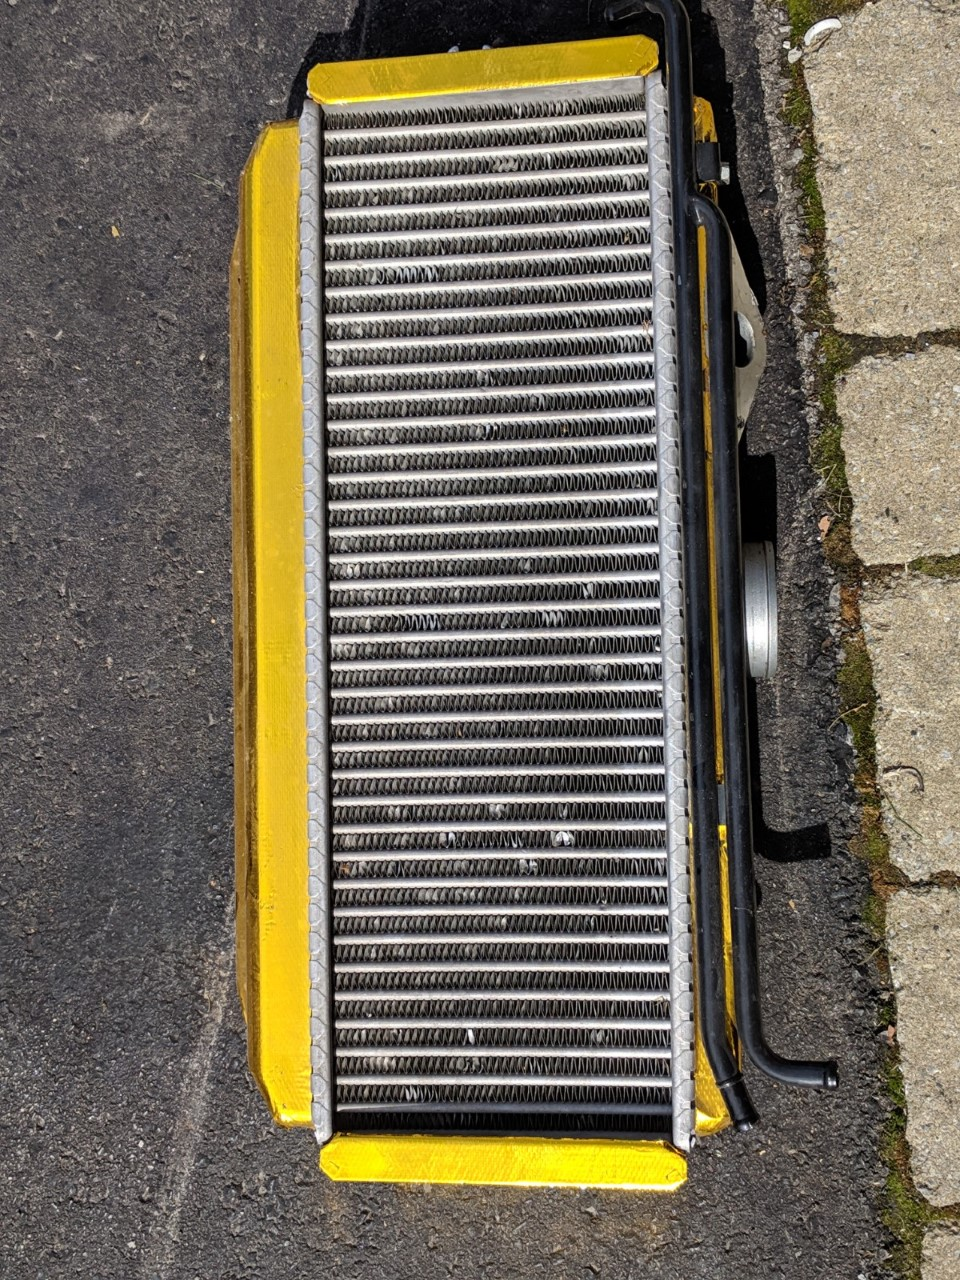 STI GR Intercooler, used, 50000km 0usd-thumbnail_img_20190504_153129-jpg